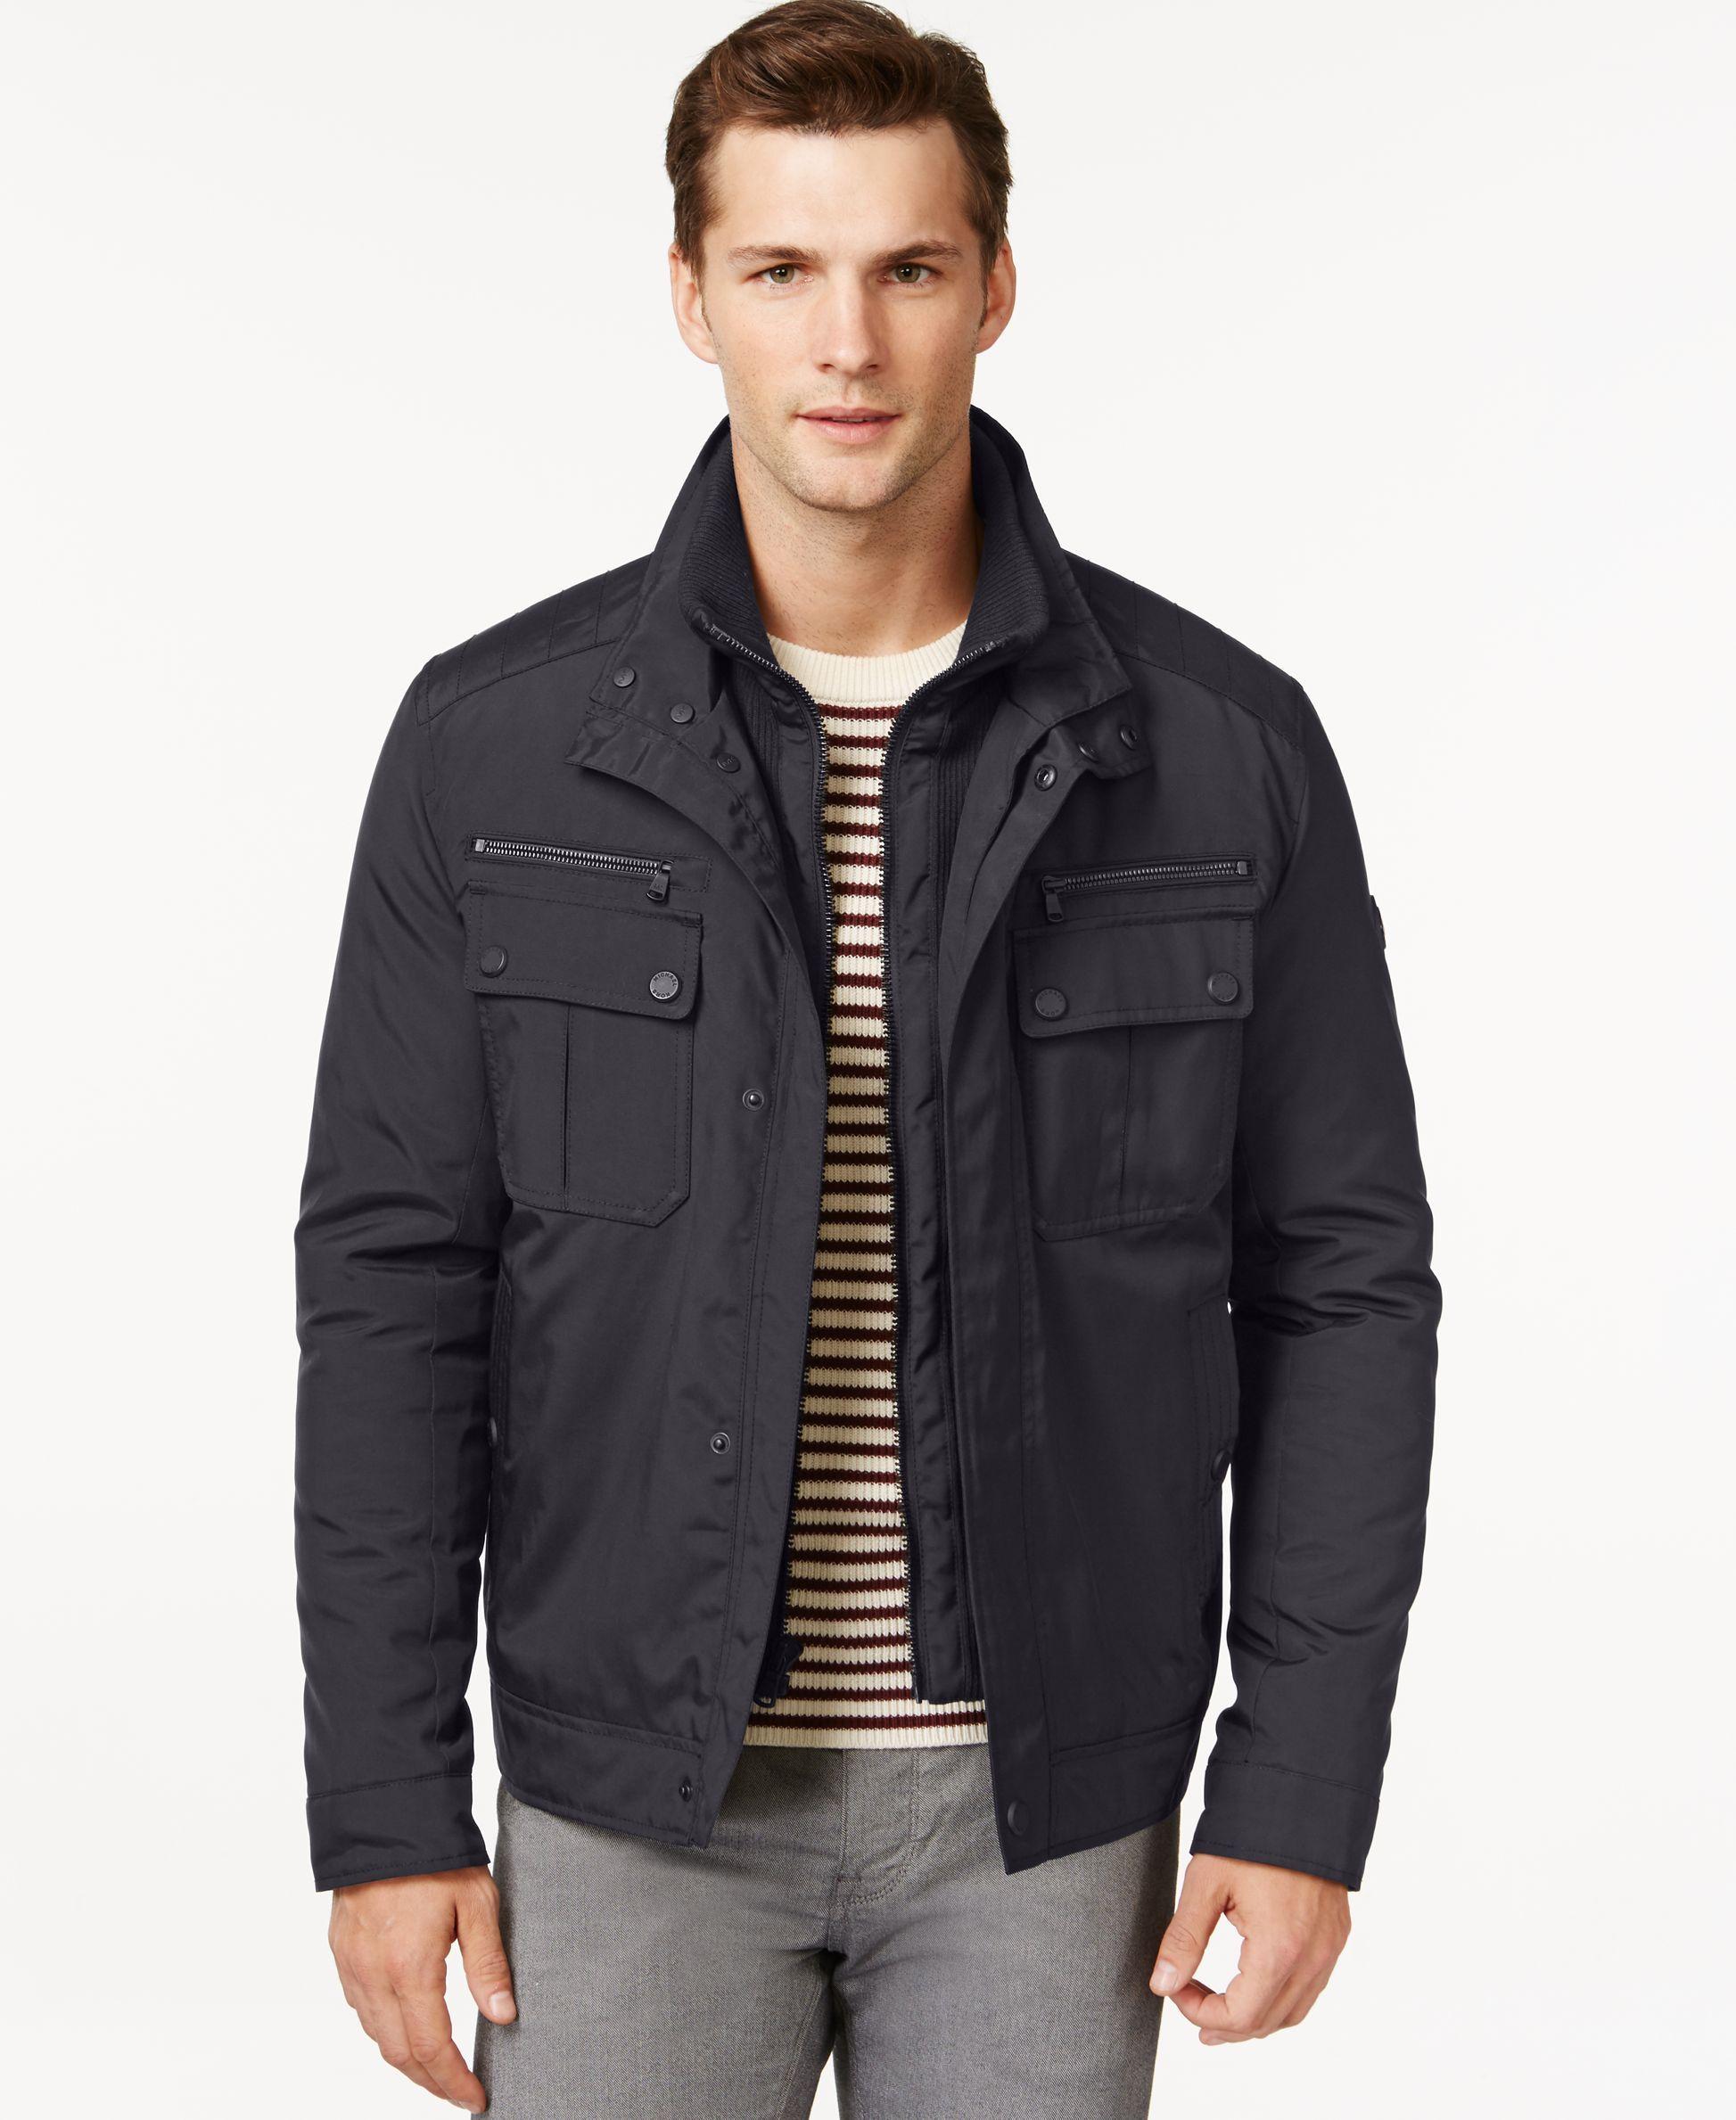 7885e0ba5b8bc0 Michael Kors Oxford Hipster Jacket | TNT lil dynomite | Hipster ...